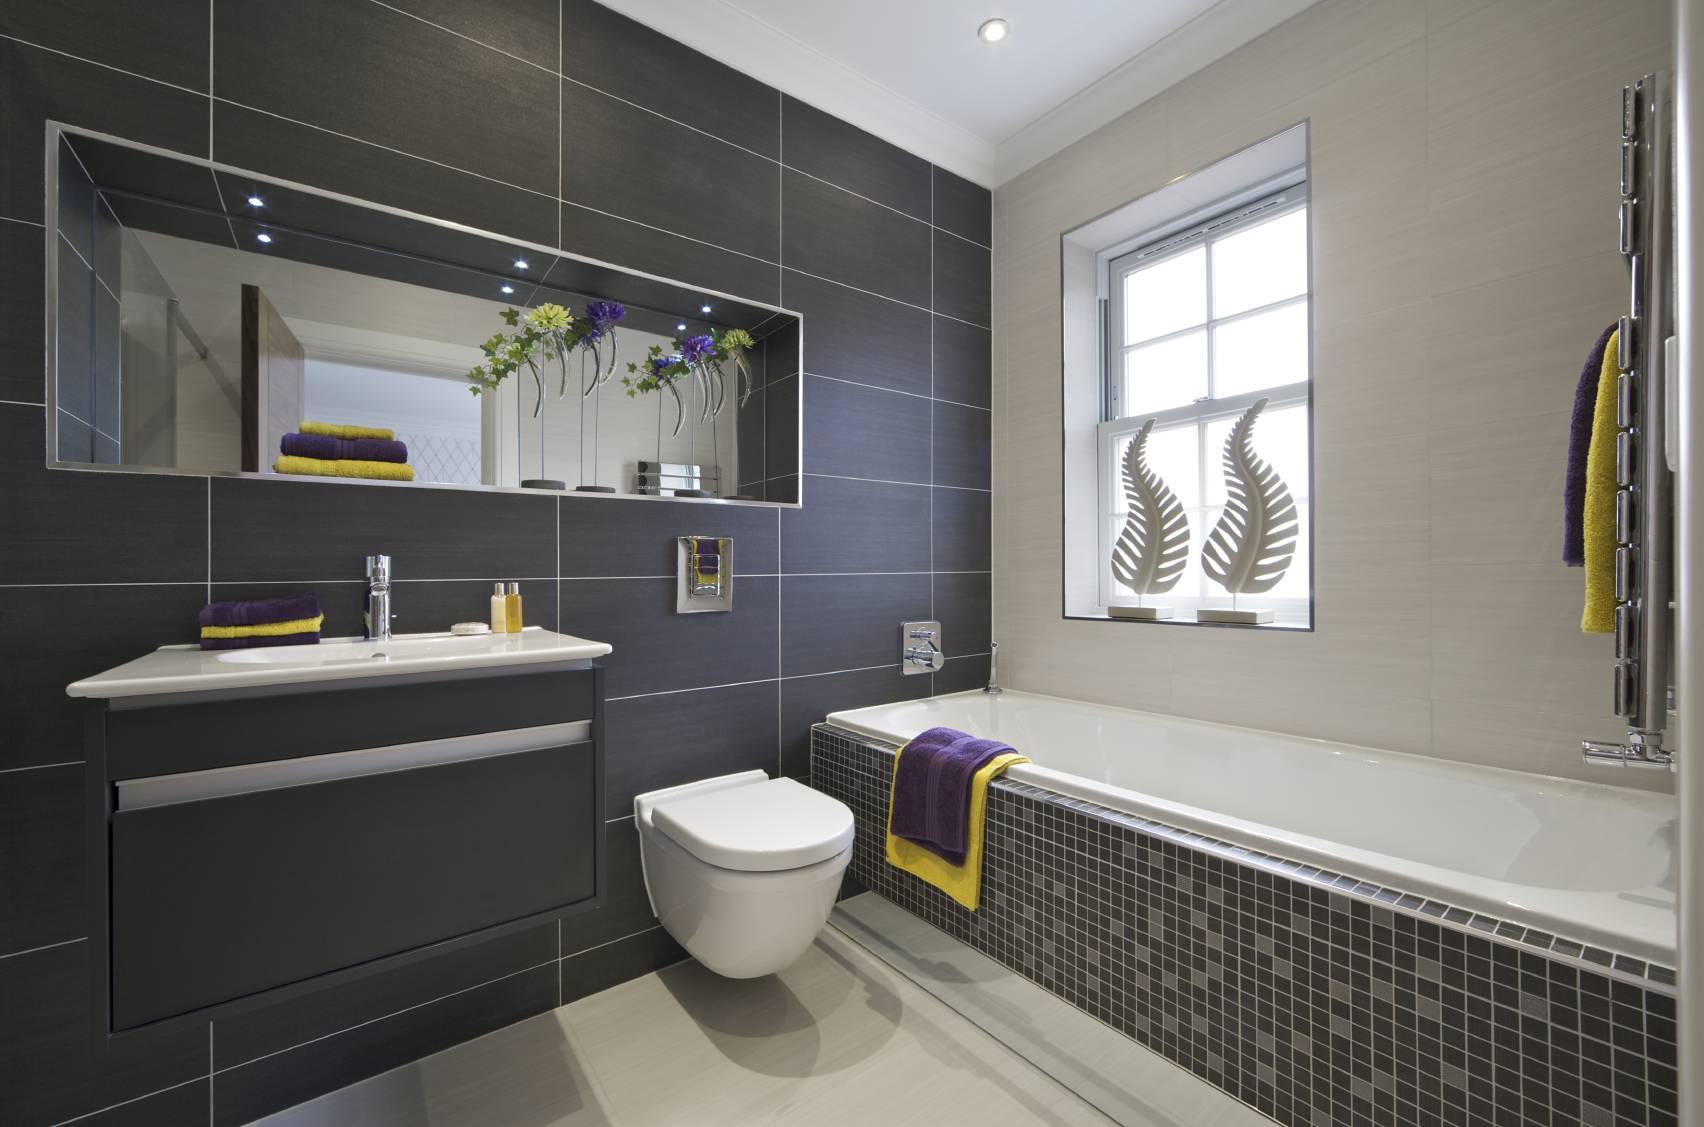 5 conseils pour entretenir et faire briller sa salle de for Conseil salle de bain